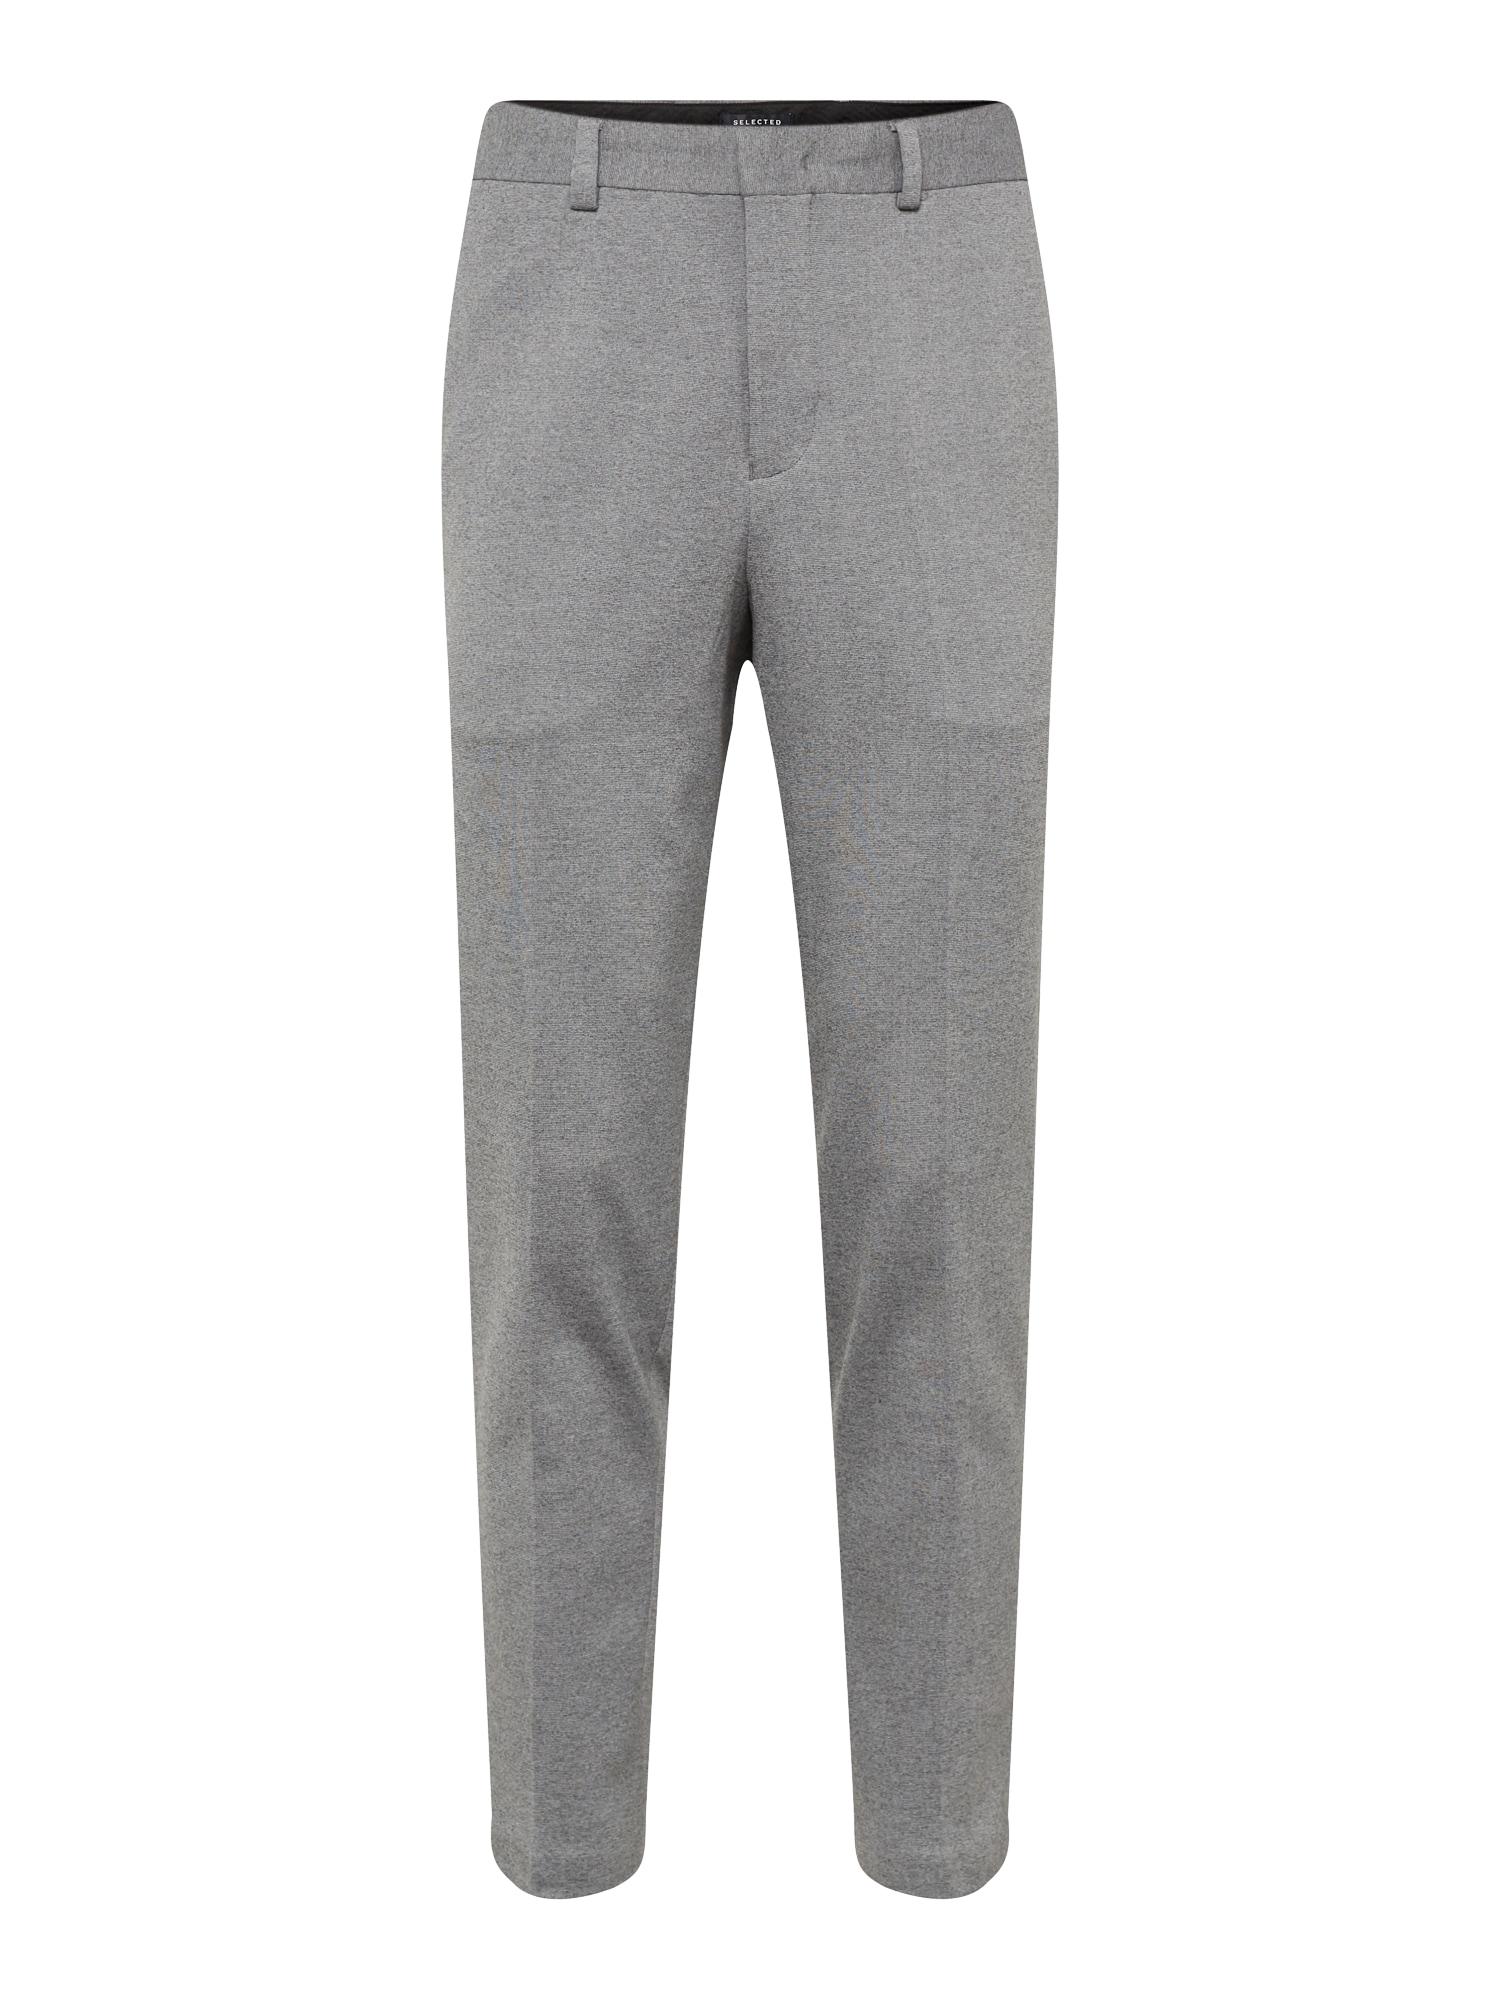 Kalhoty s puky šedá SELECTED HOMME